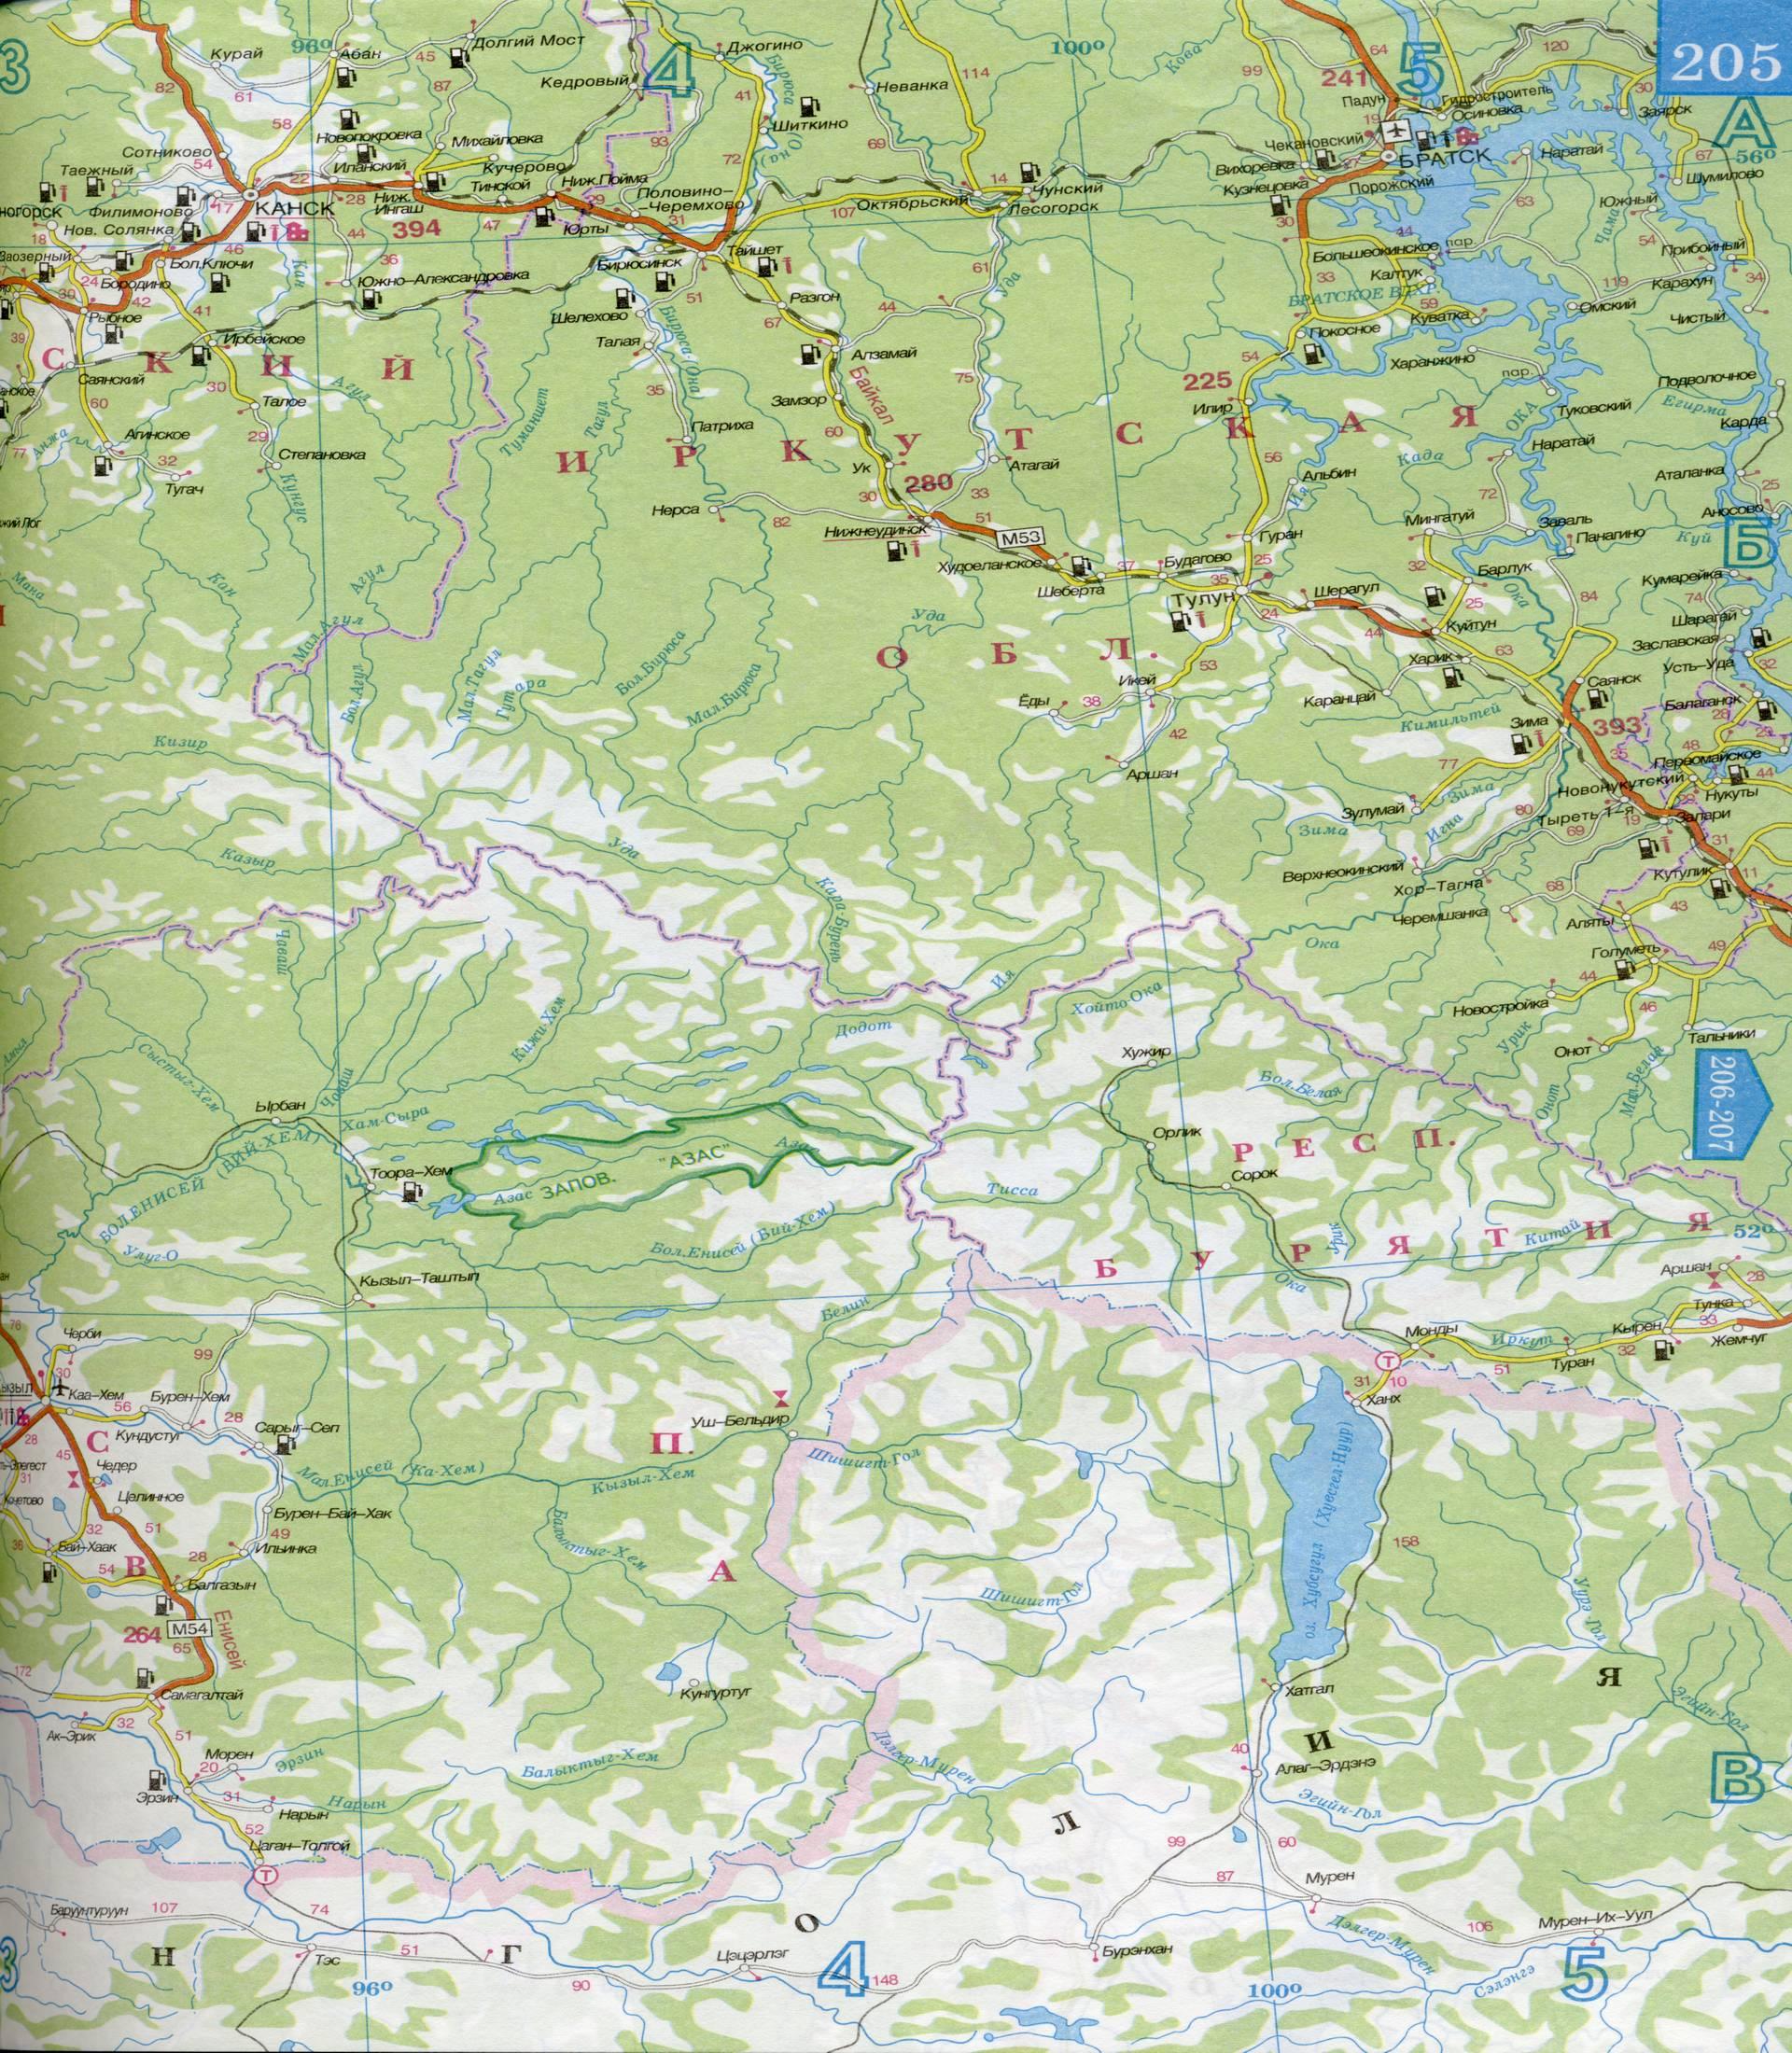 Карта Красноярского края масштаба 1см:30км.  Подробная карта - Красноярский край.